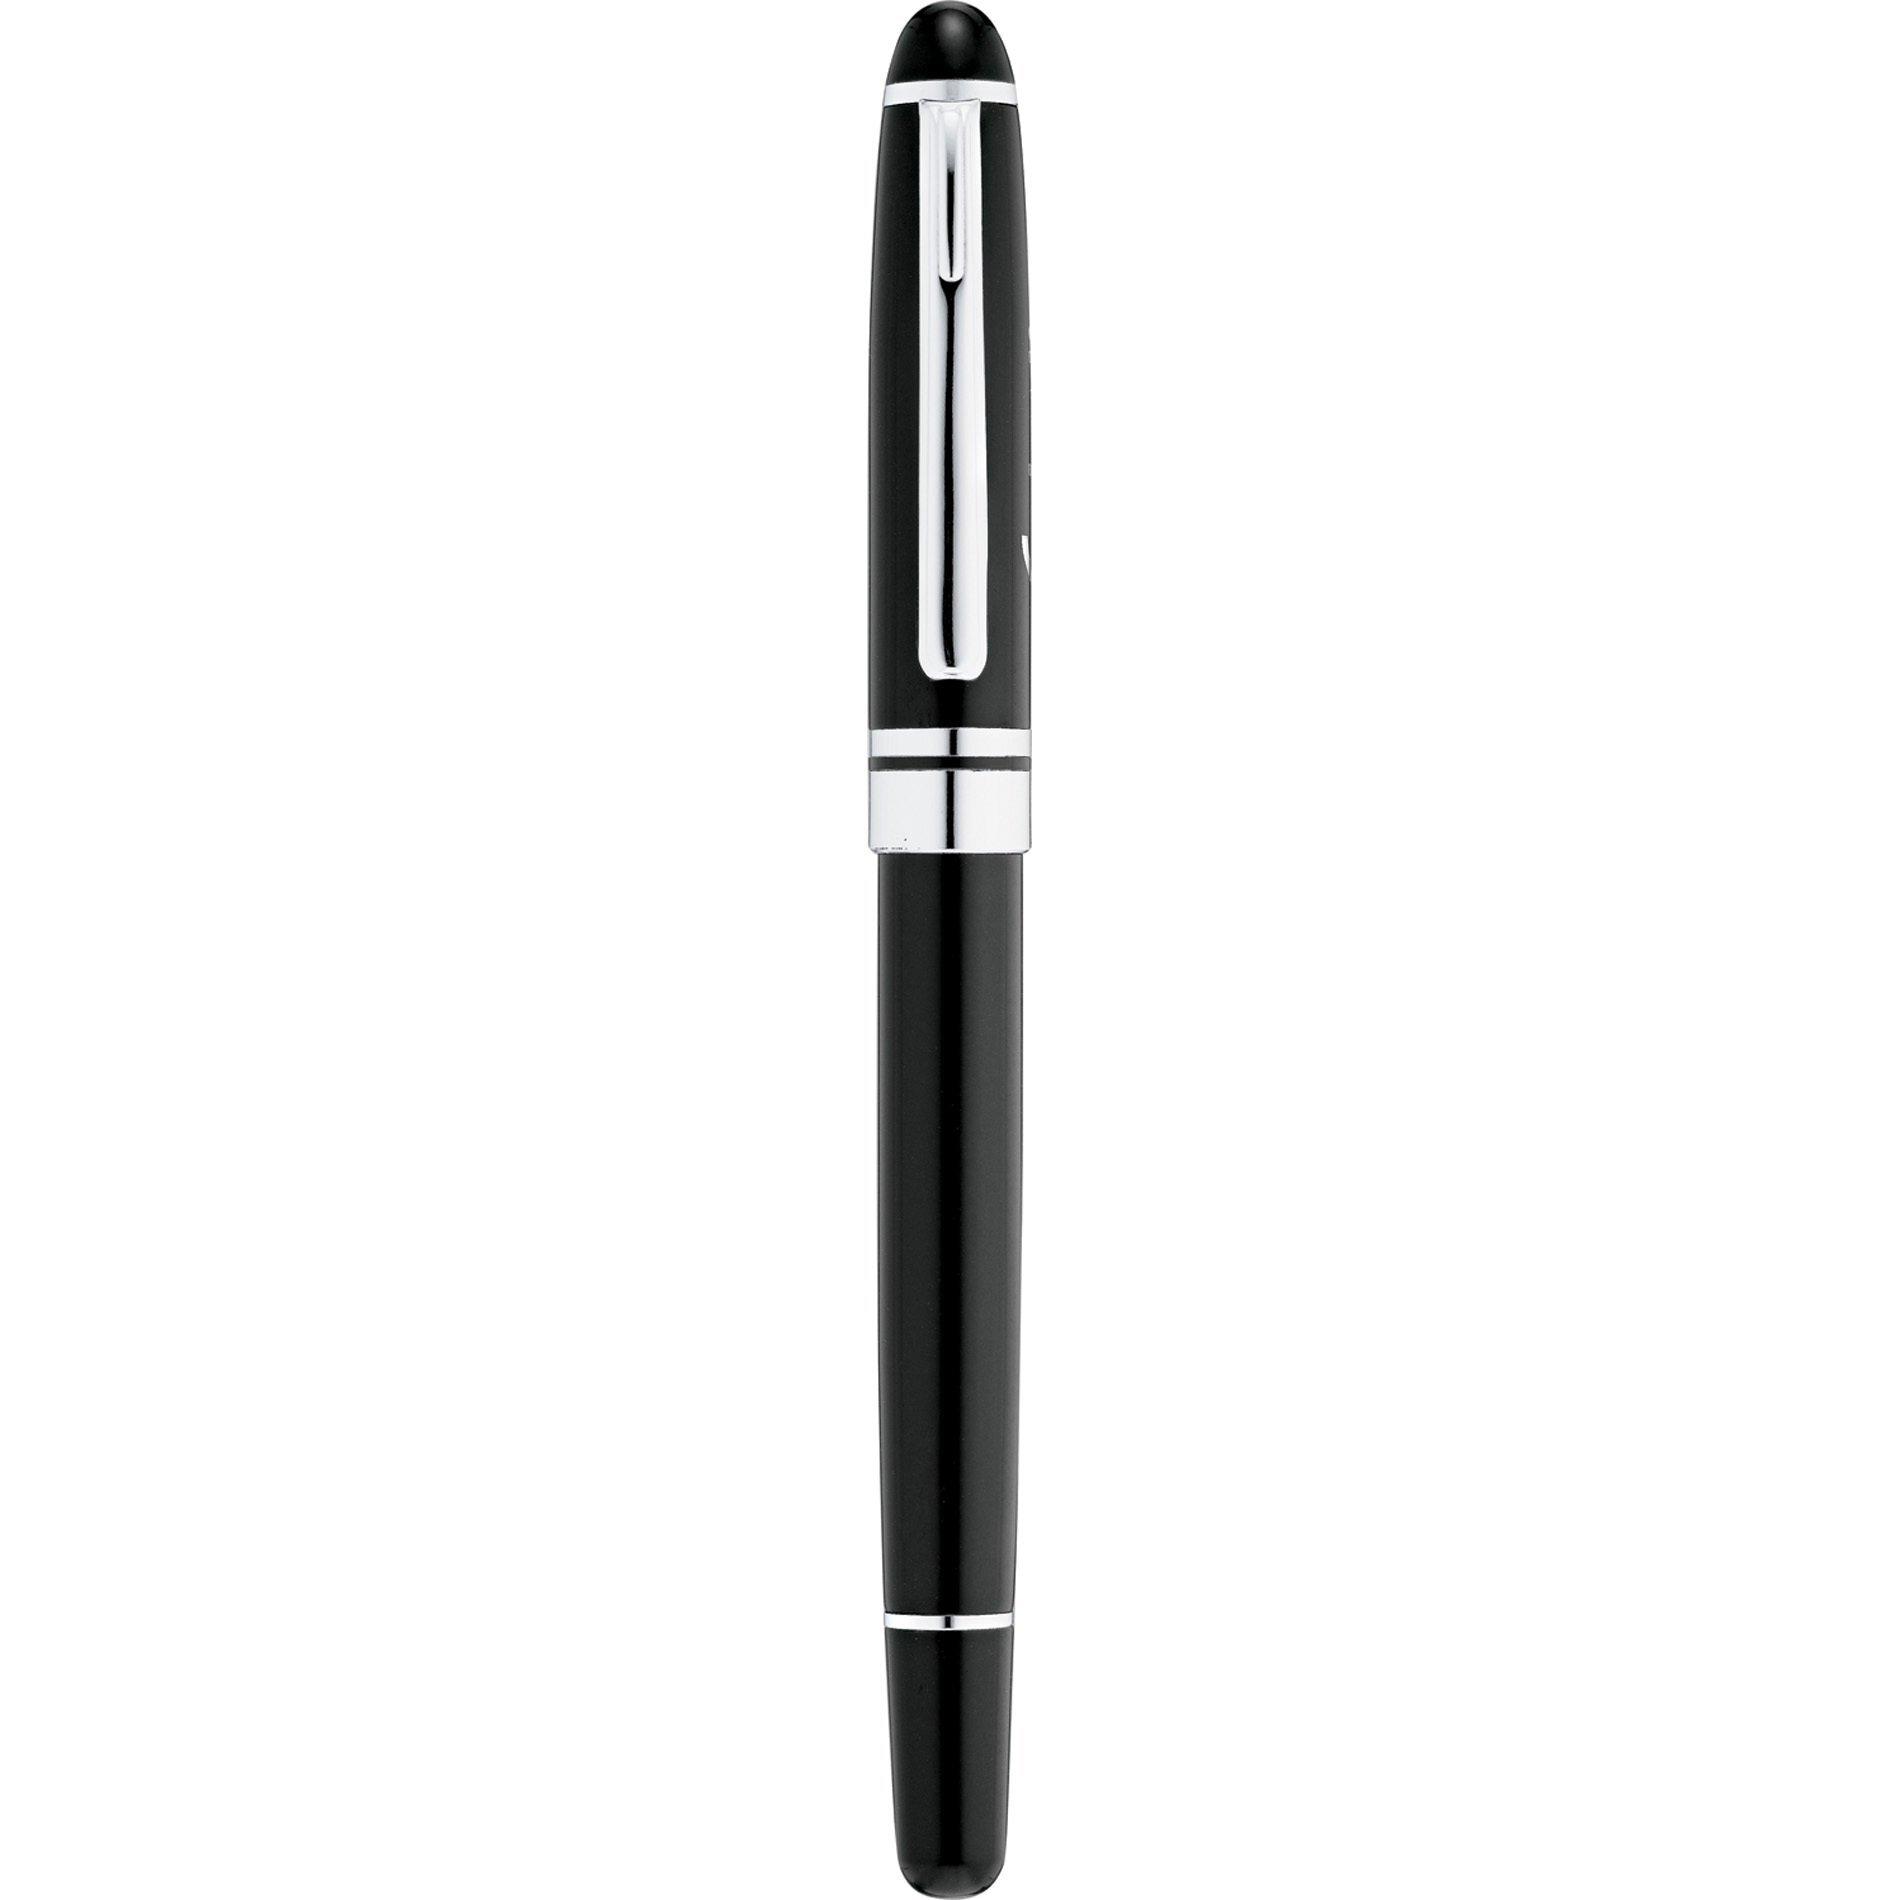 Bristol Rollerball Metal Gift Pen